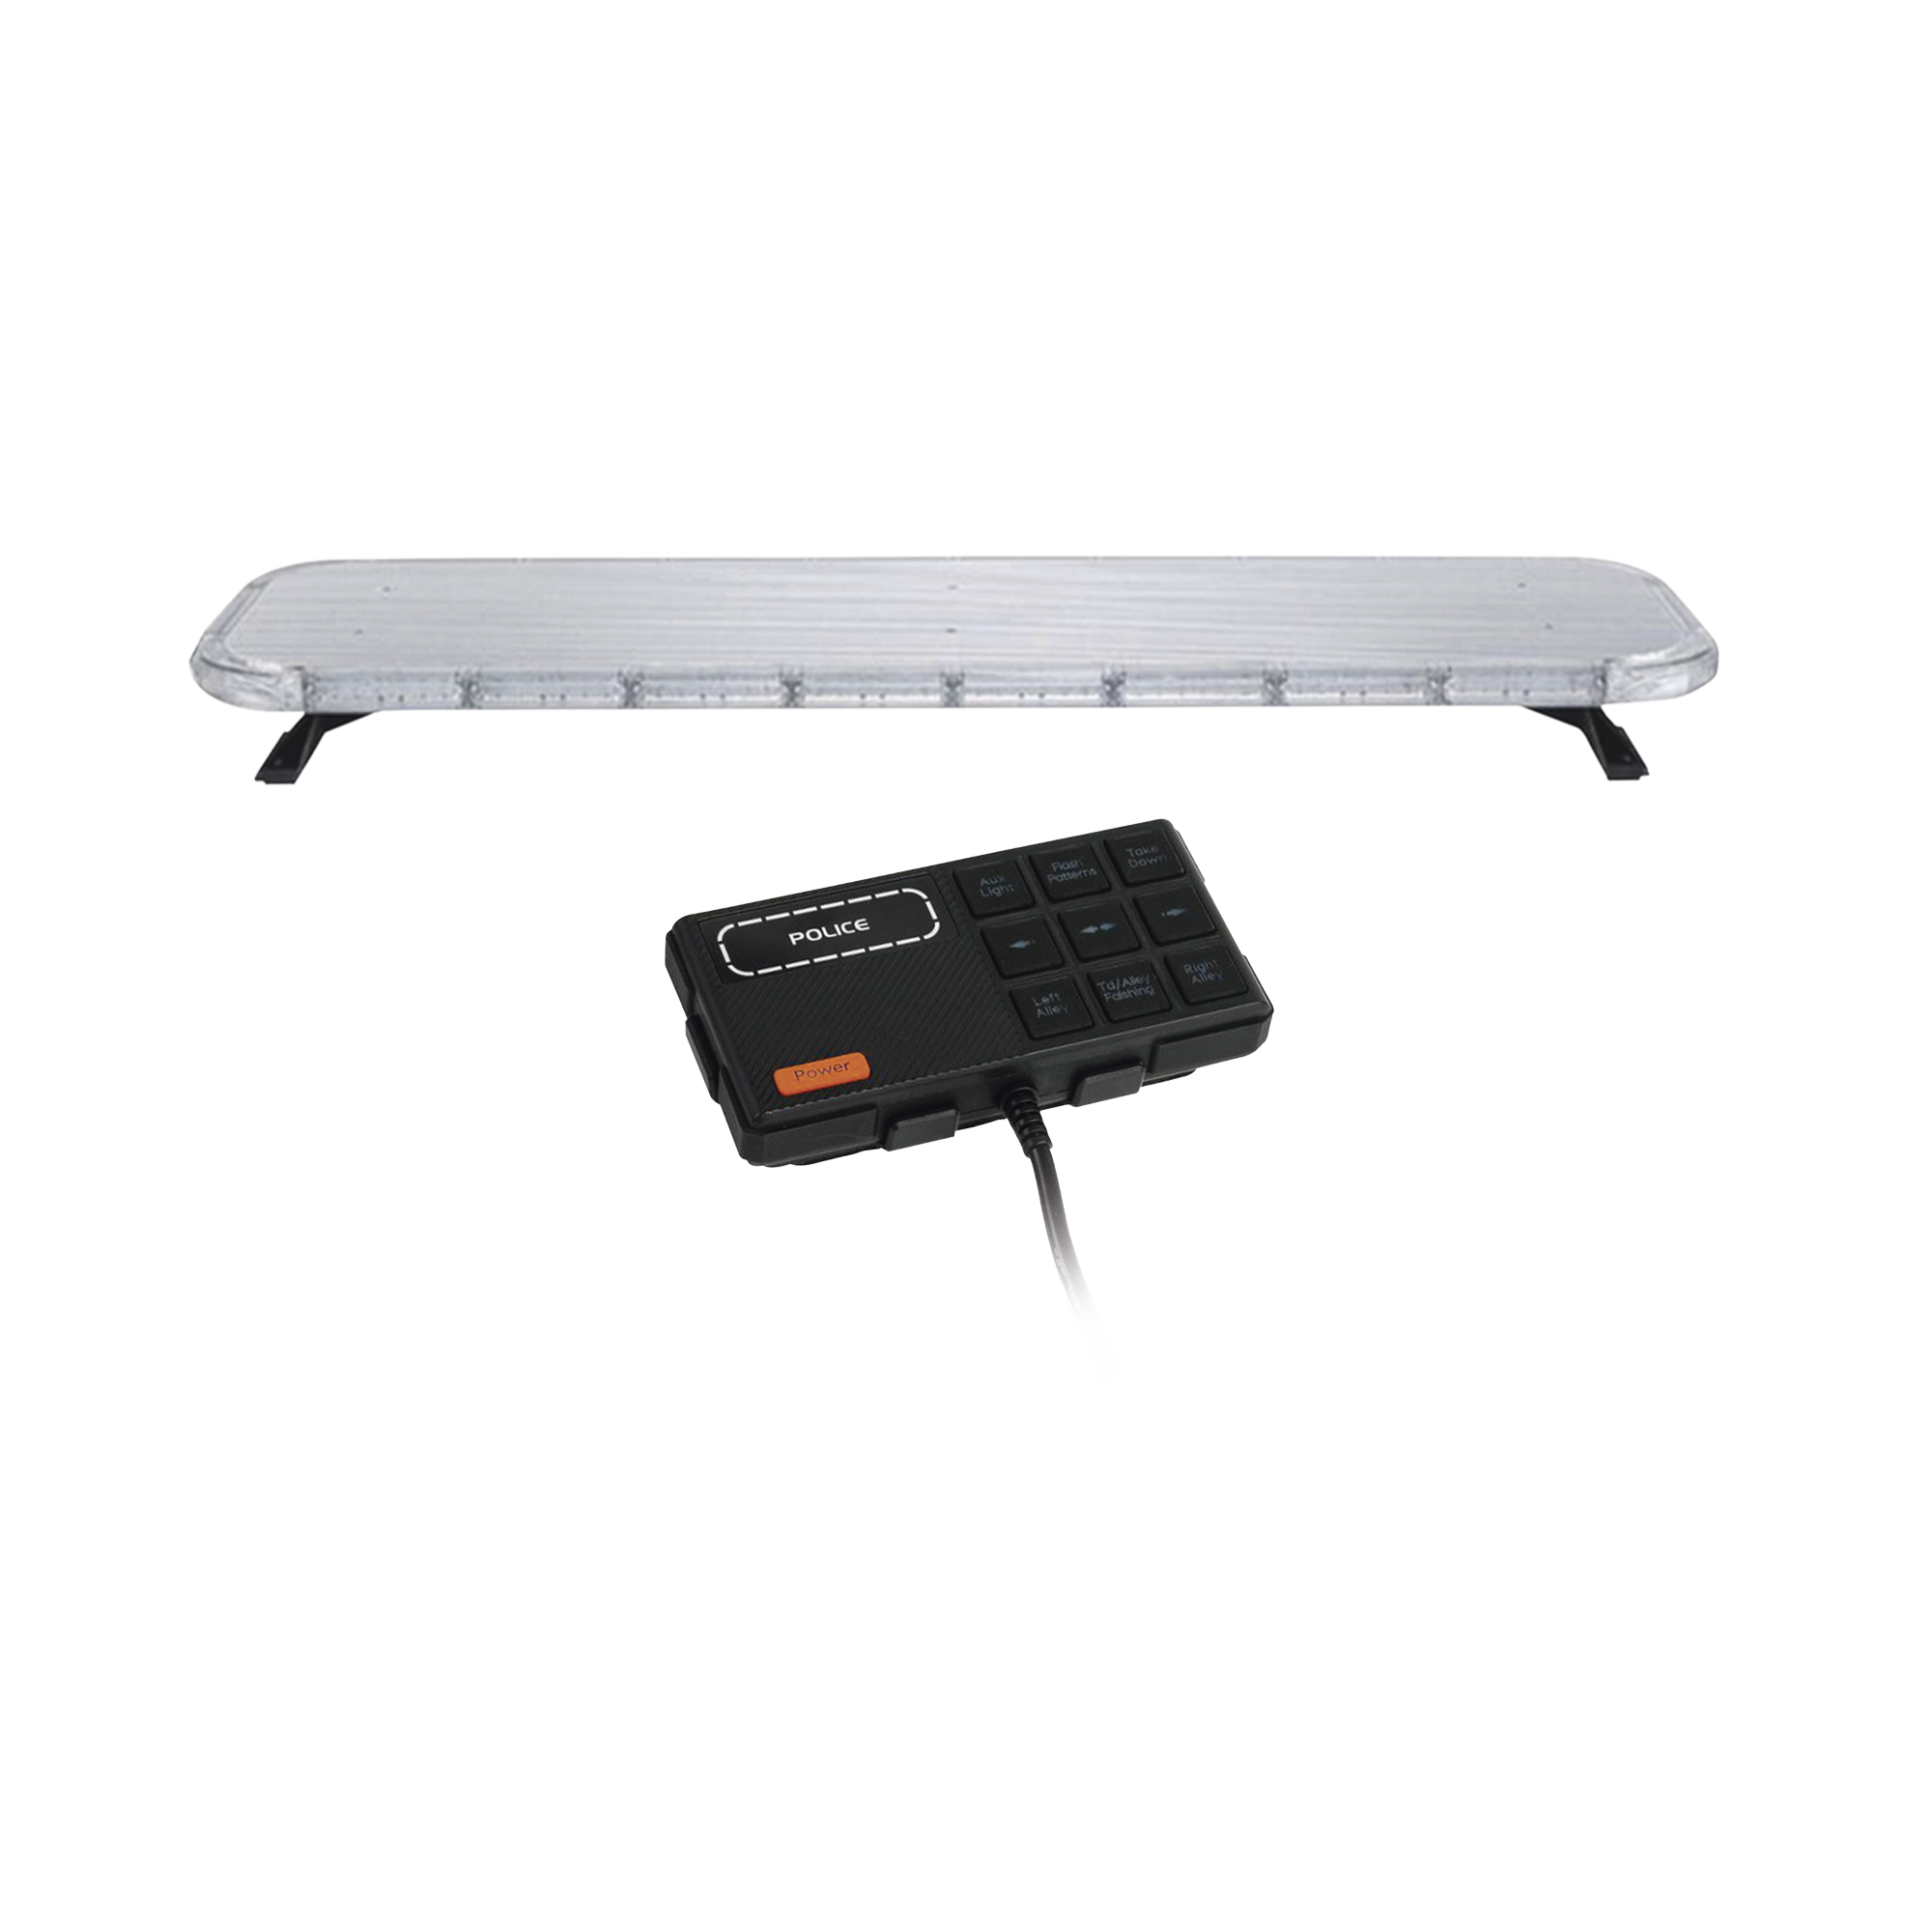 Barra de luces LED de 47 Rojo/Azul/Ambar , De 132 LEDs, Controlador Incluido, Ideal para Equipar Unidades de Seguridad Publica